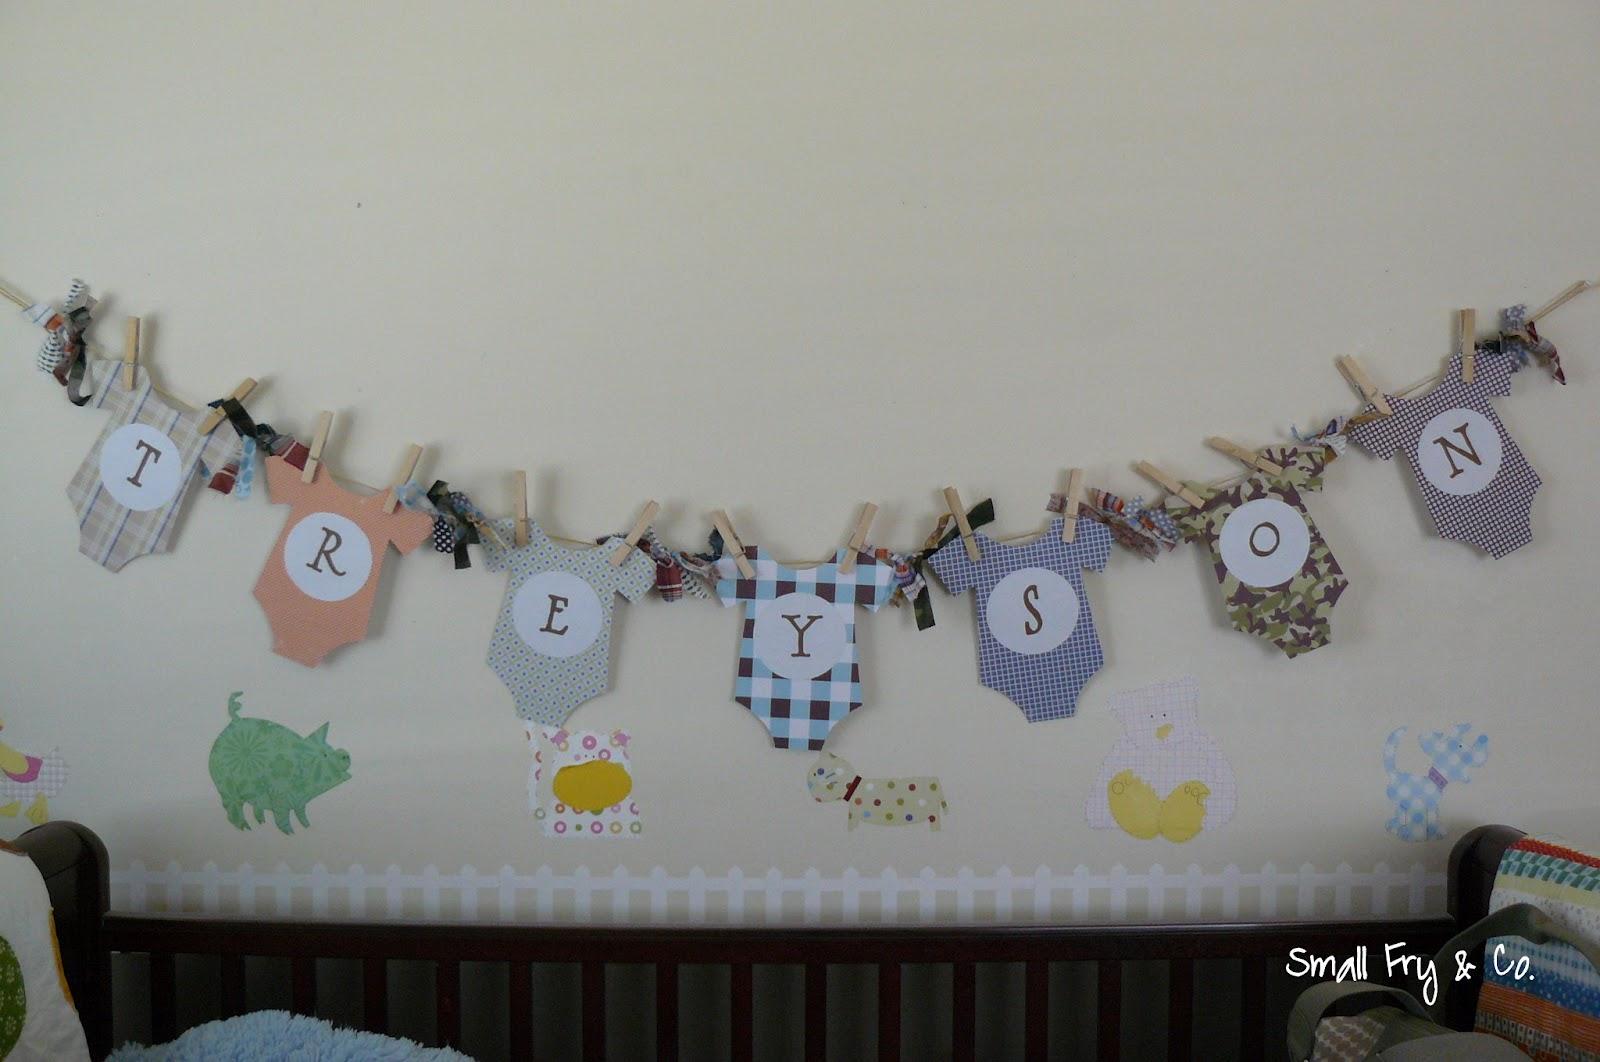 ... Baby Onesie Template For Baby Shower Invitations , Baby Onesie Banner